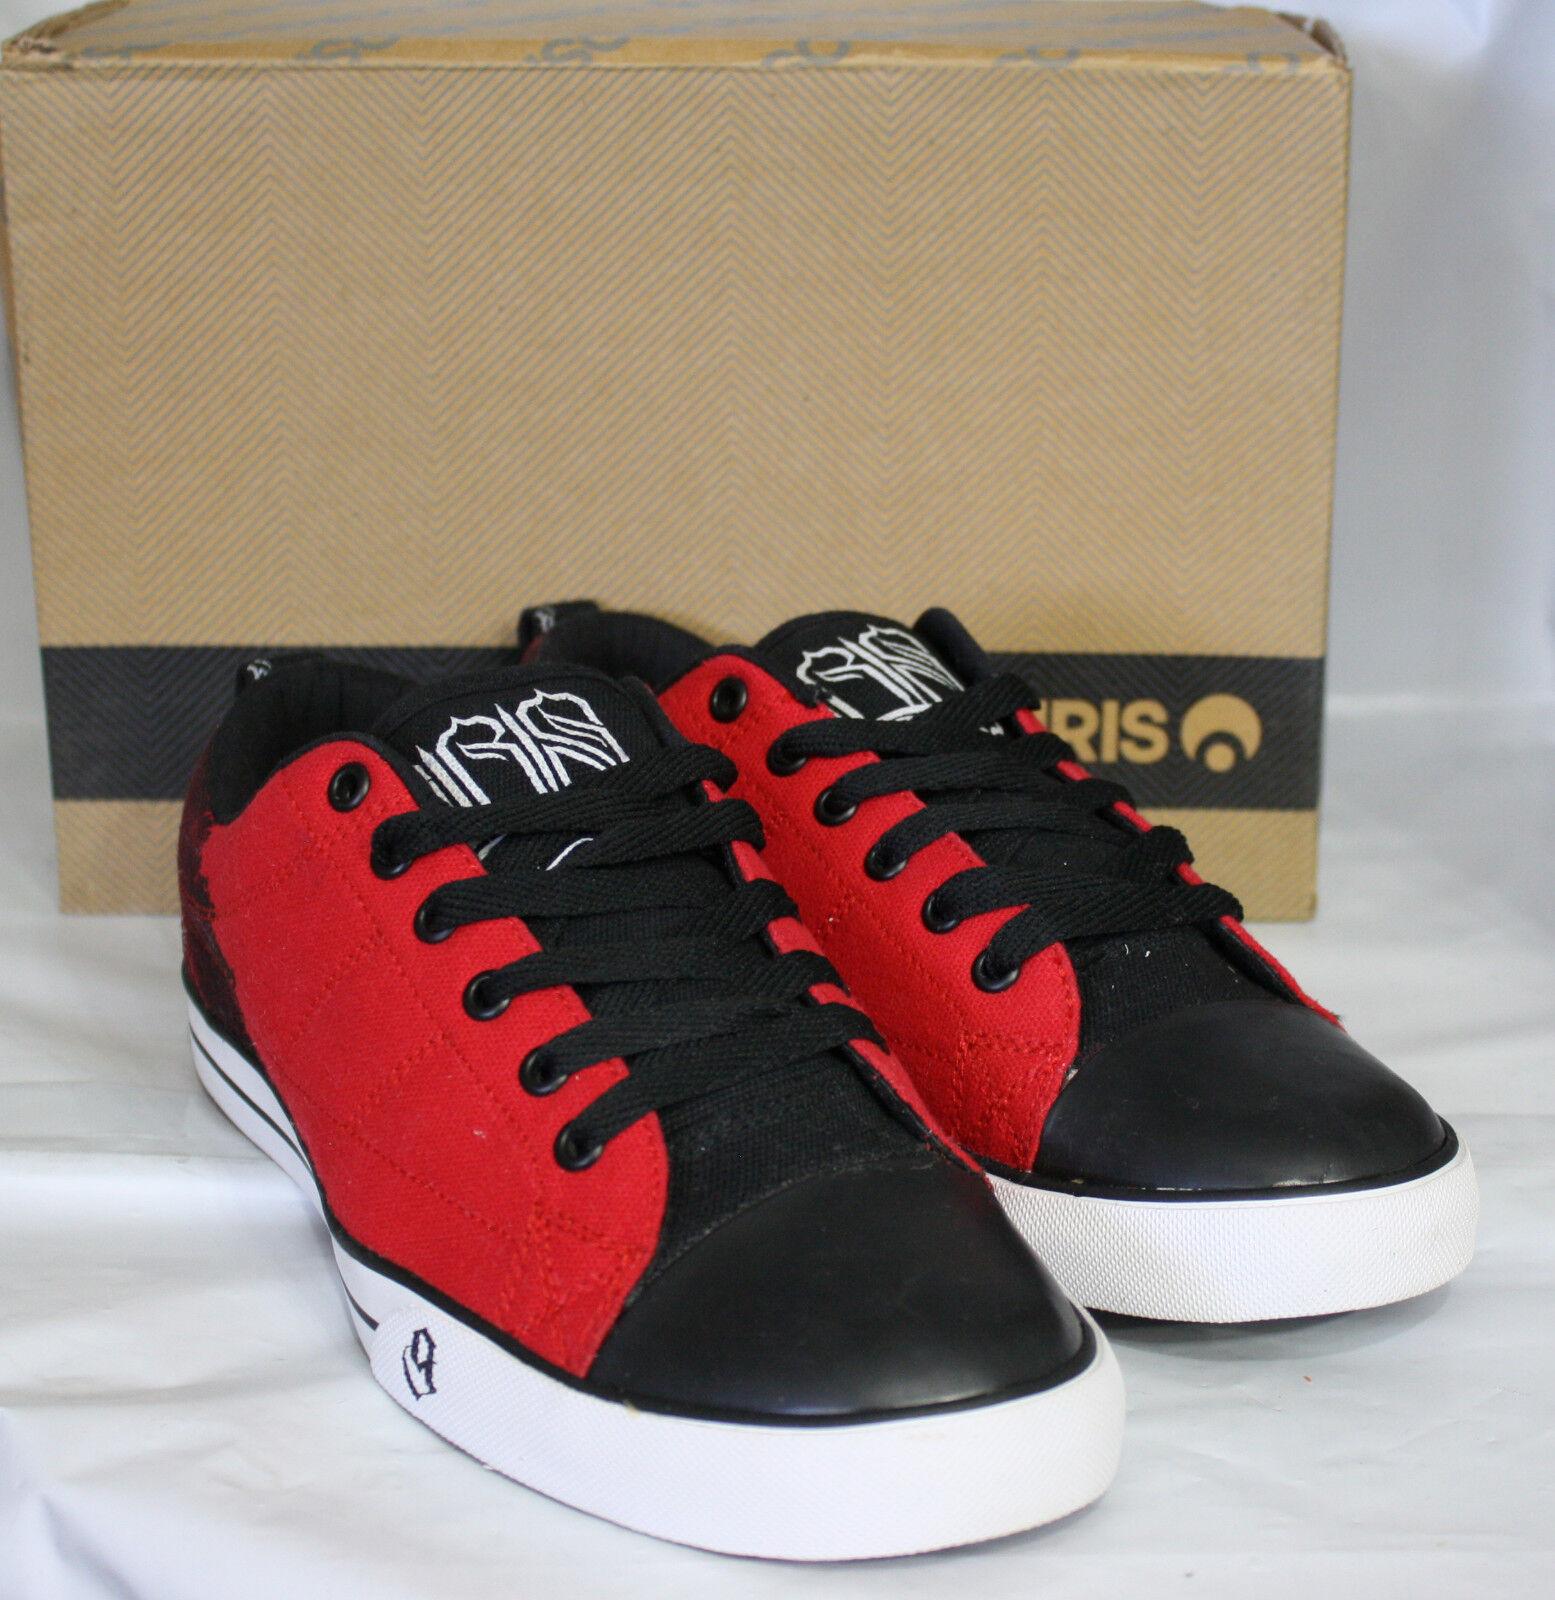 Uomo osiride 45 scarpe skateboard scarpe 45 - 12151837 2e18a7